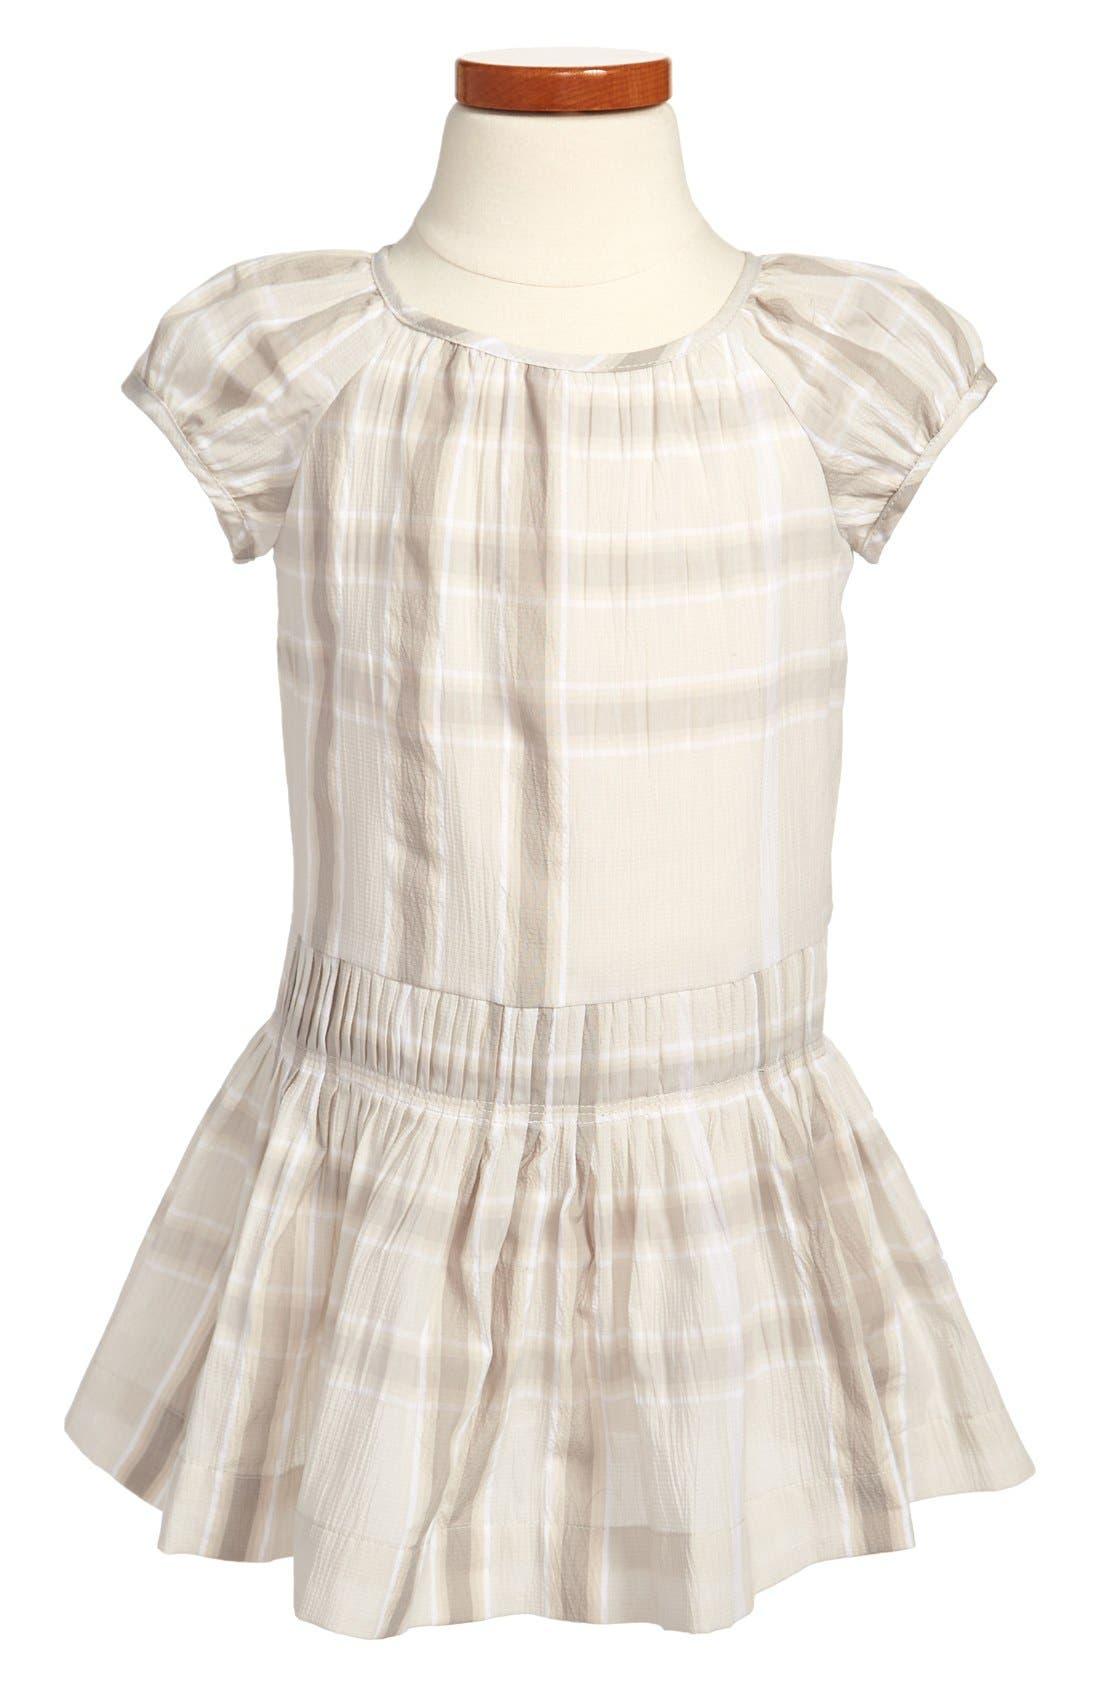 Alternate Image 1 Selected - Burberry 'Edemme' Dress (Little Girls & Big Girls)